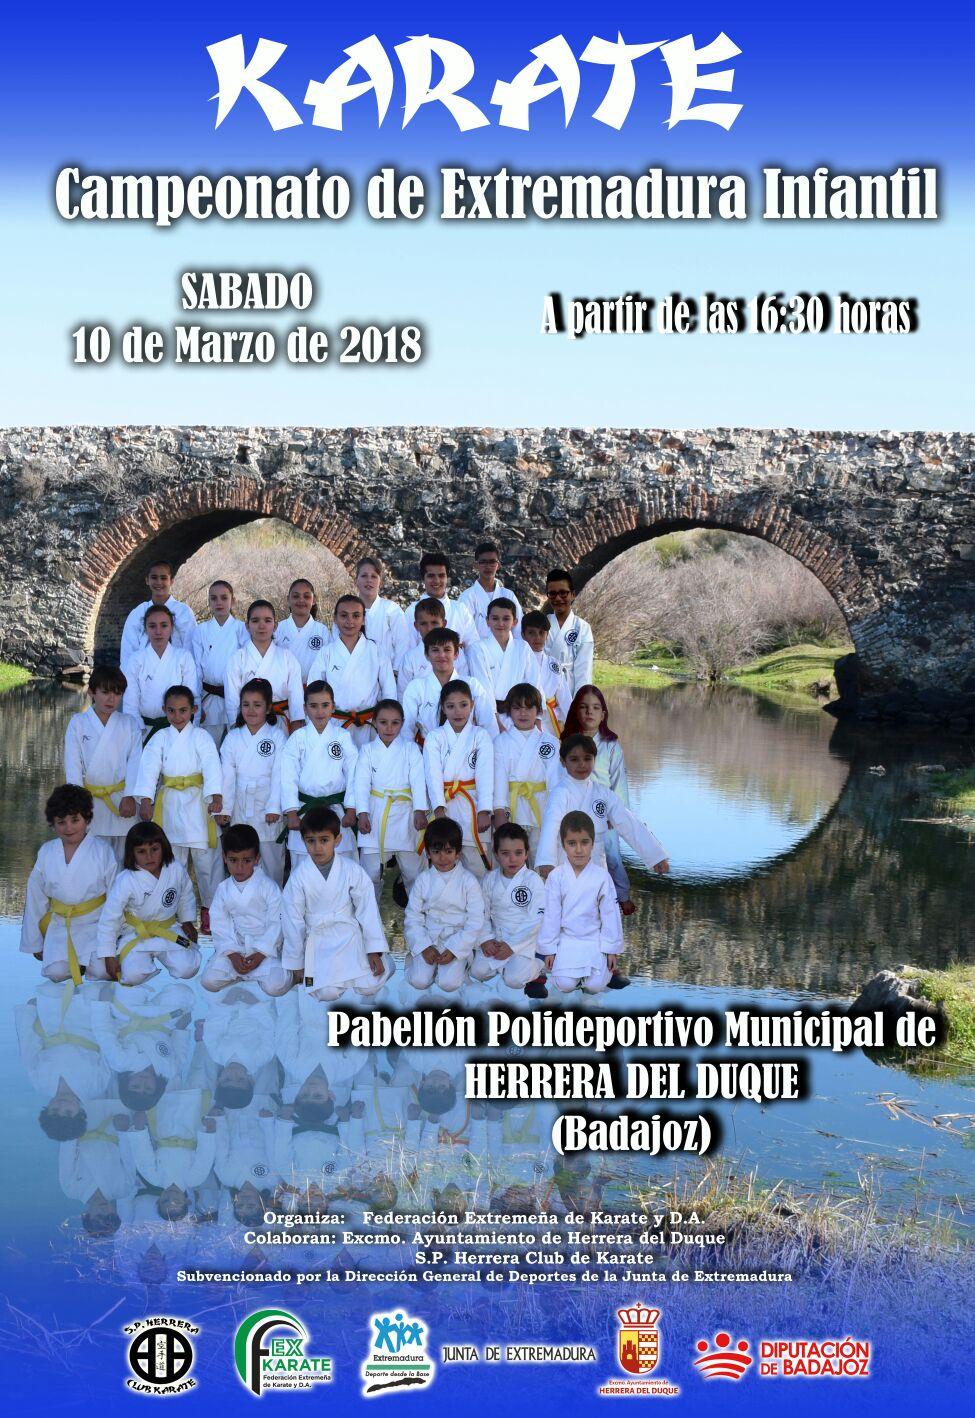 Campeonato de Extremadura Infantil 2018